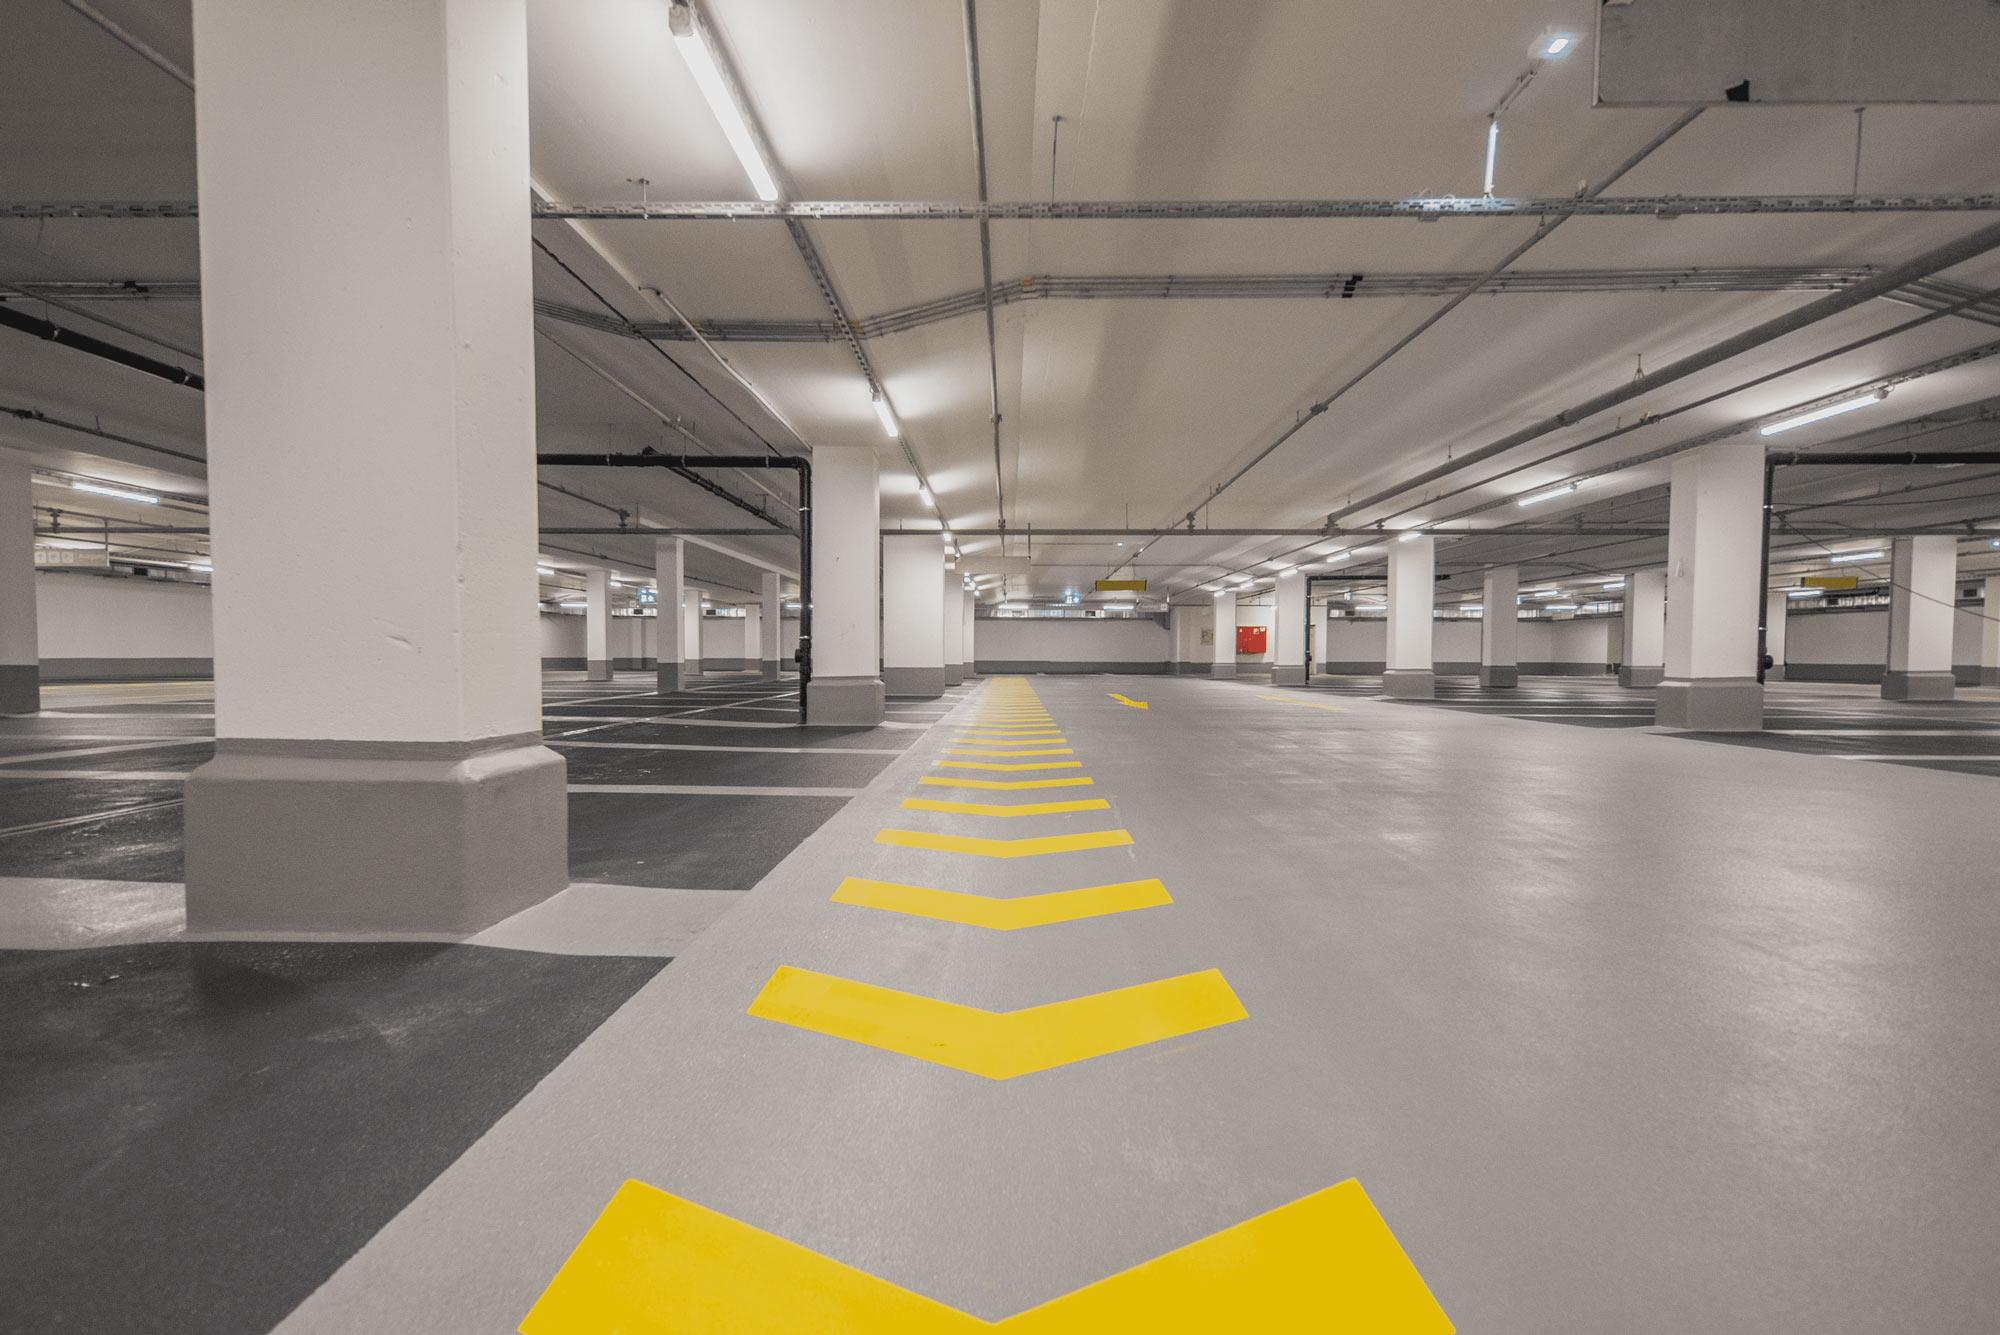 Empty parking garage with no vehicles